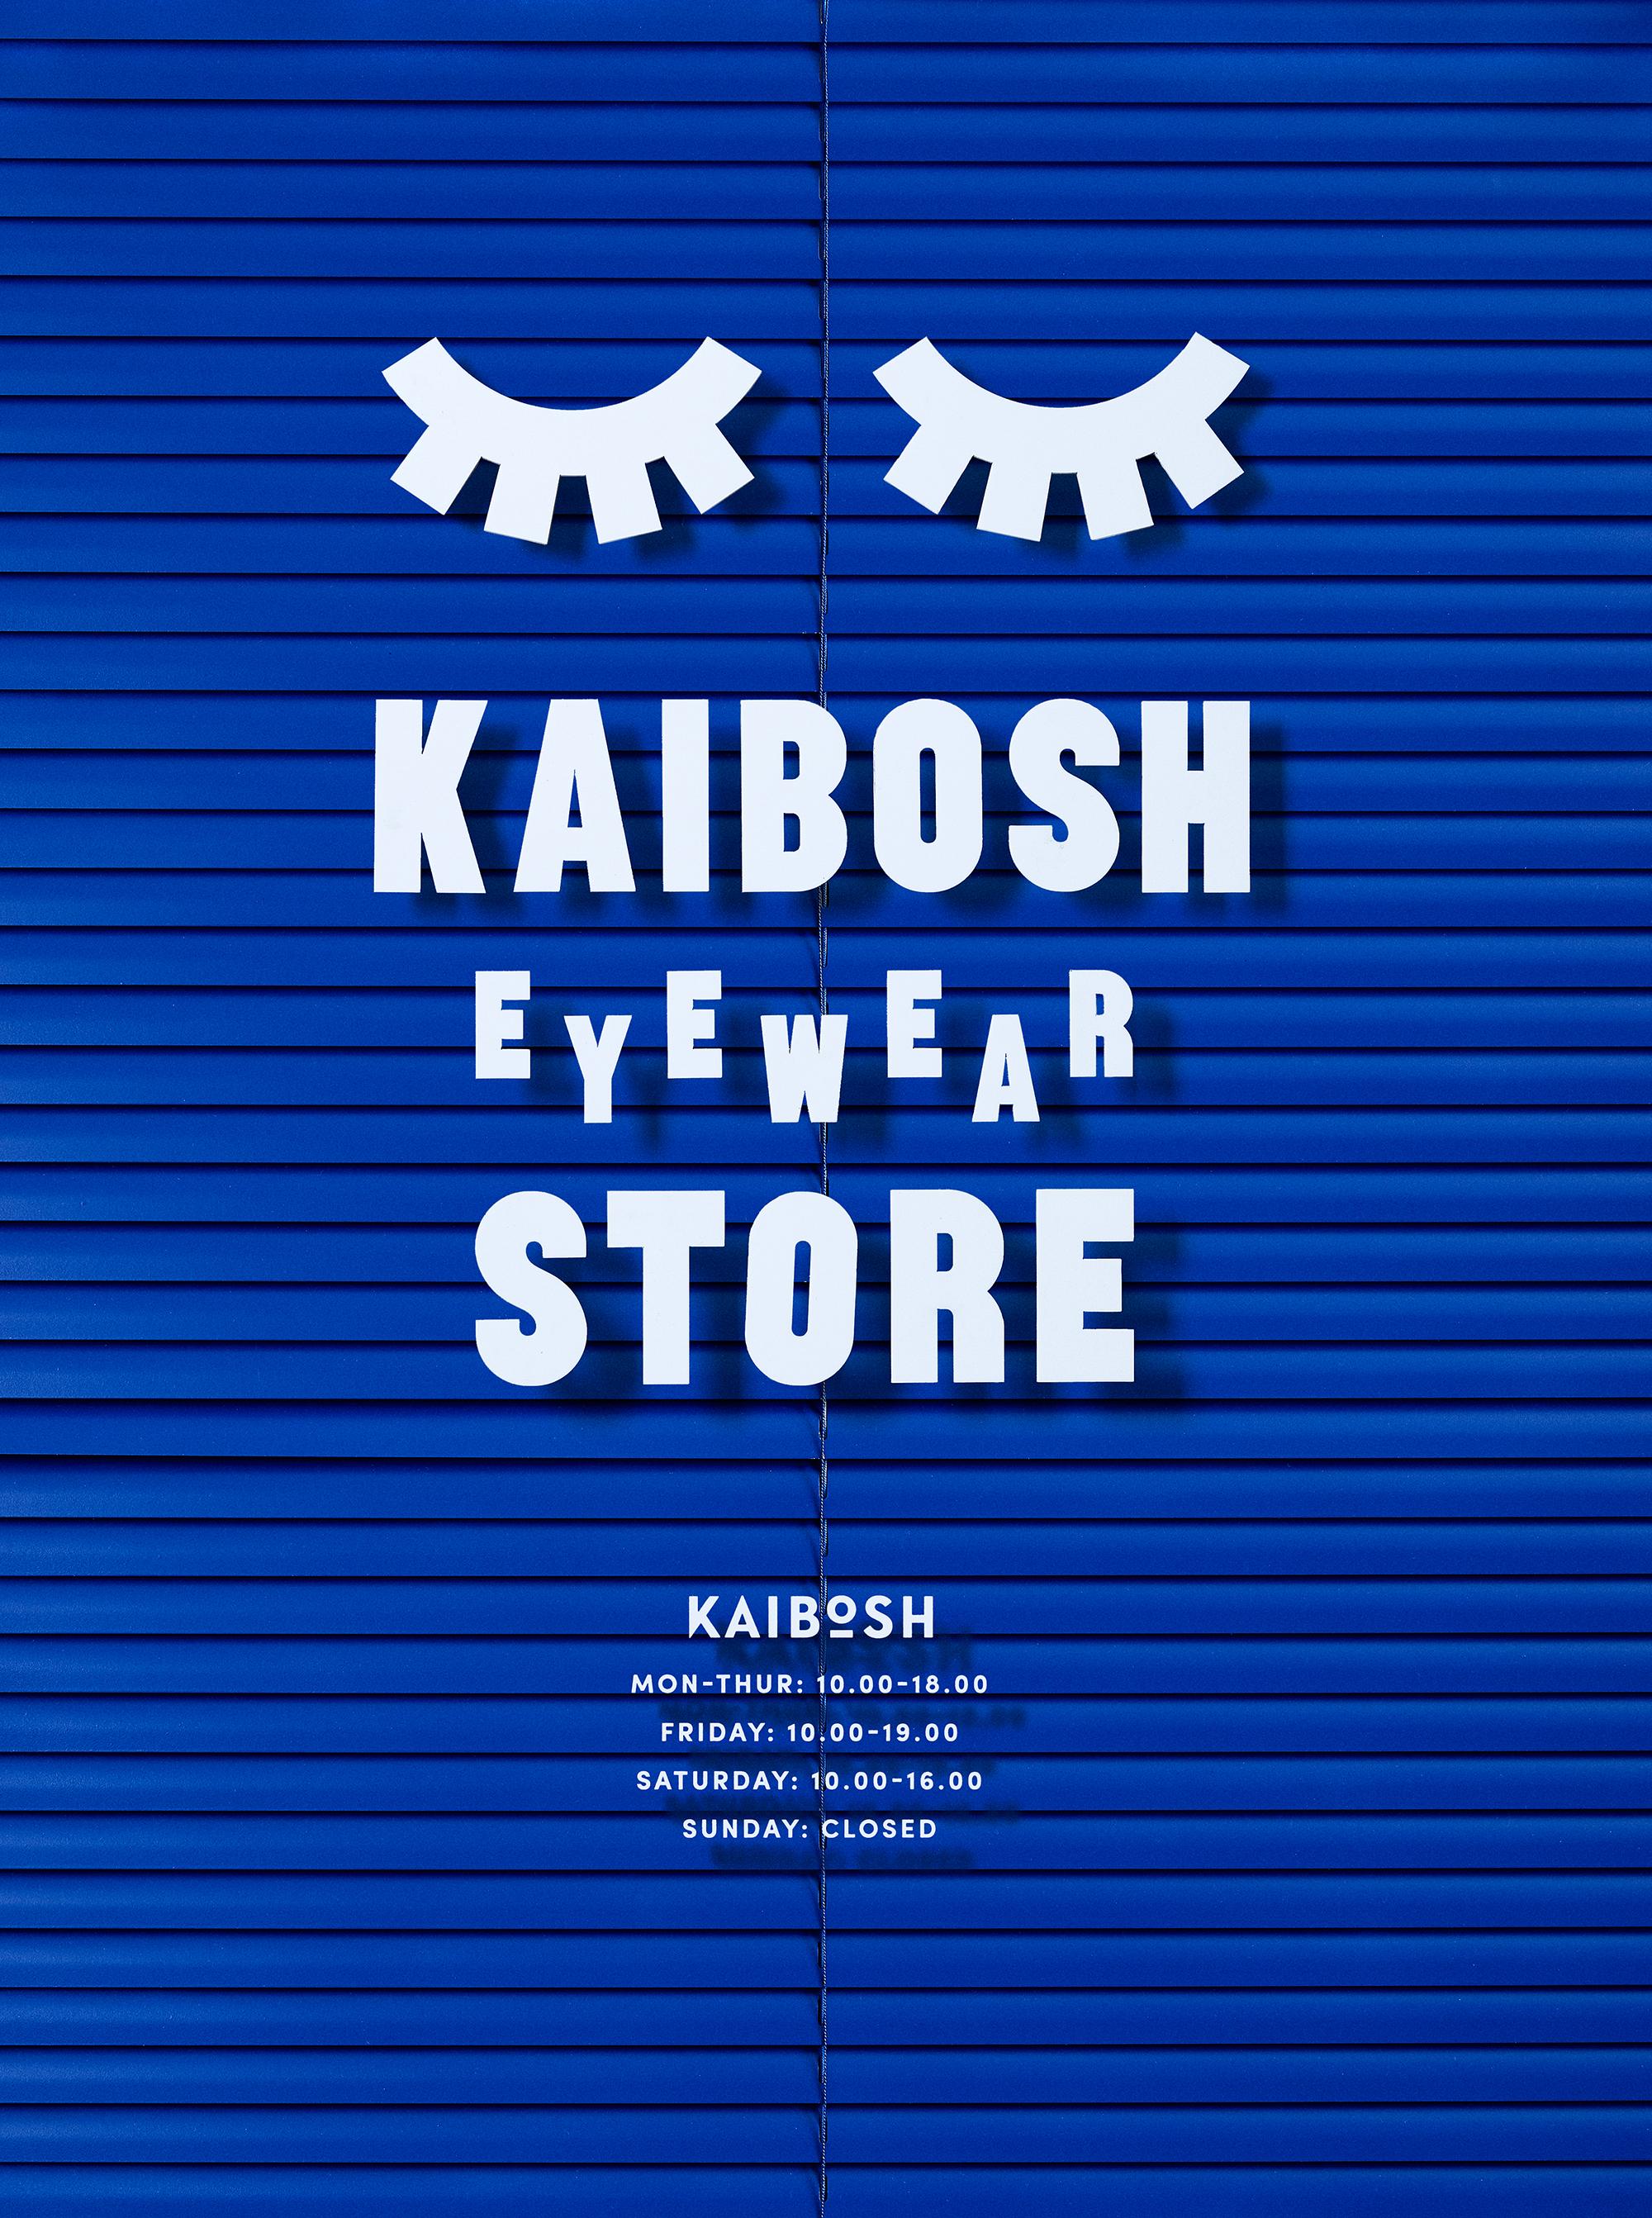 kaibosh_06_windowblinds-typography.jpg